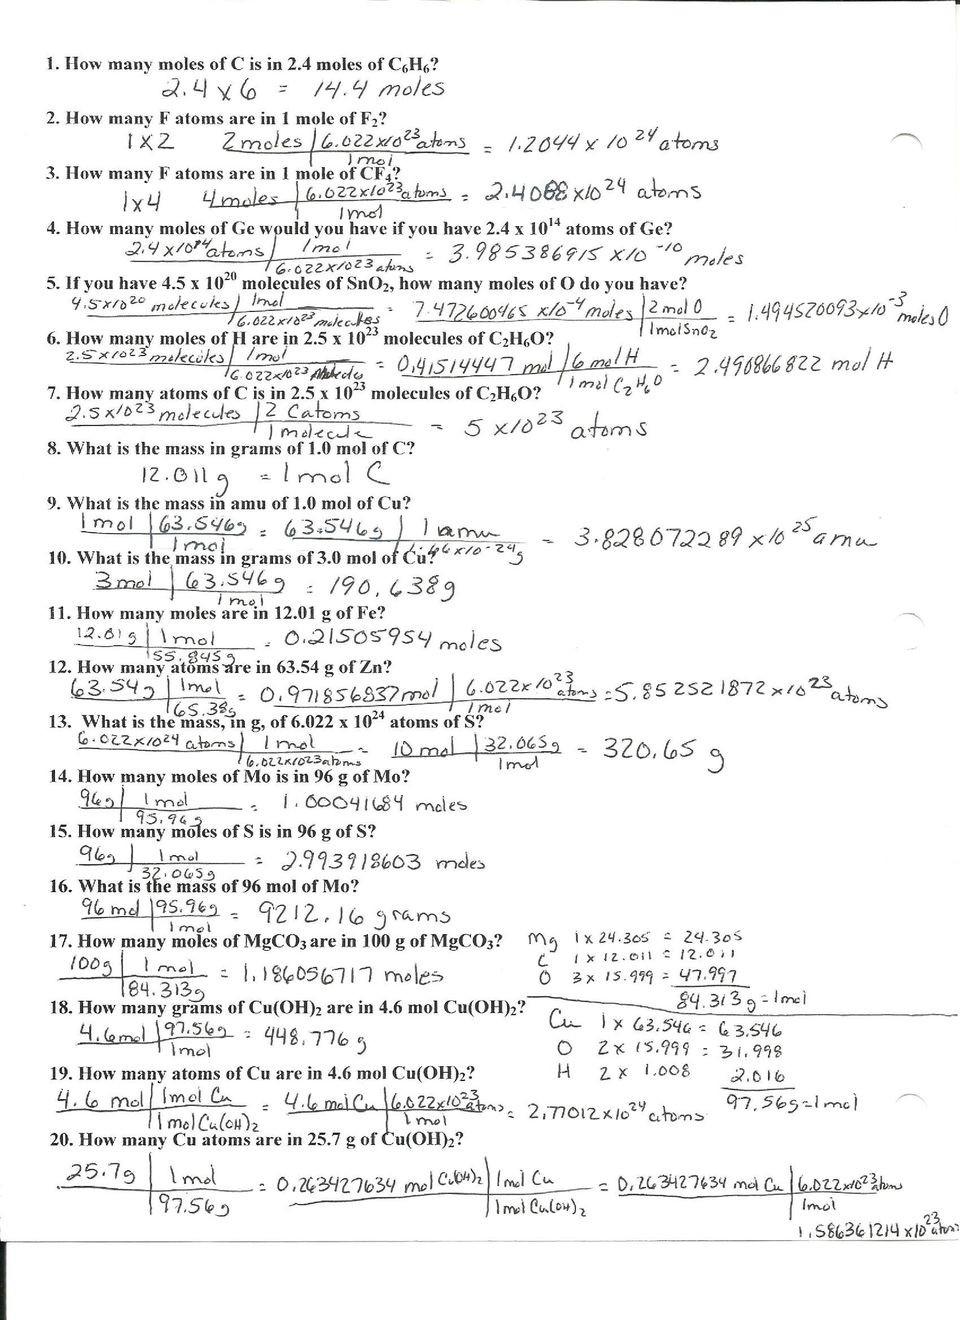 Mole Worksheet 1 Moles Molecules and Grams Worksheet Answer Key Pdf Free